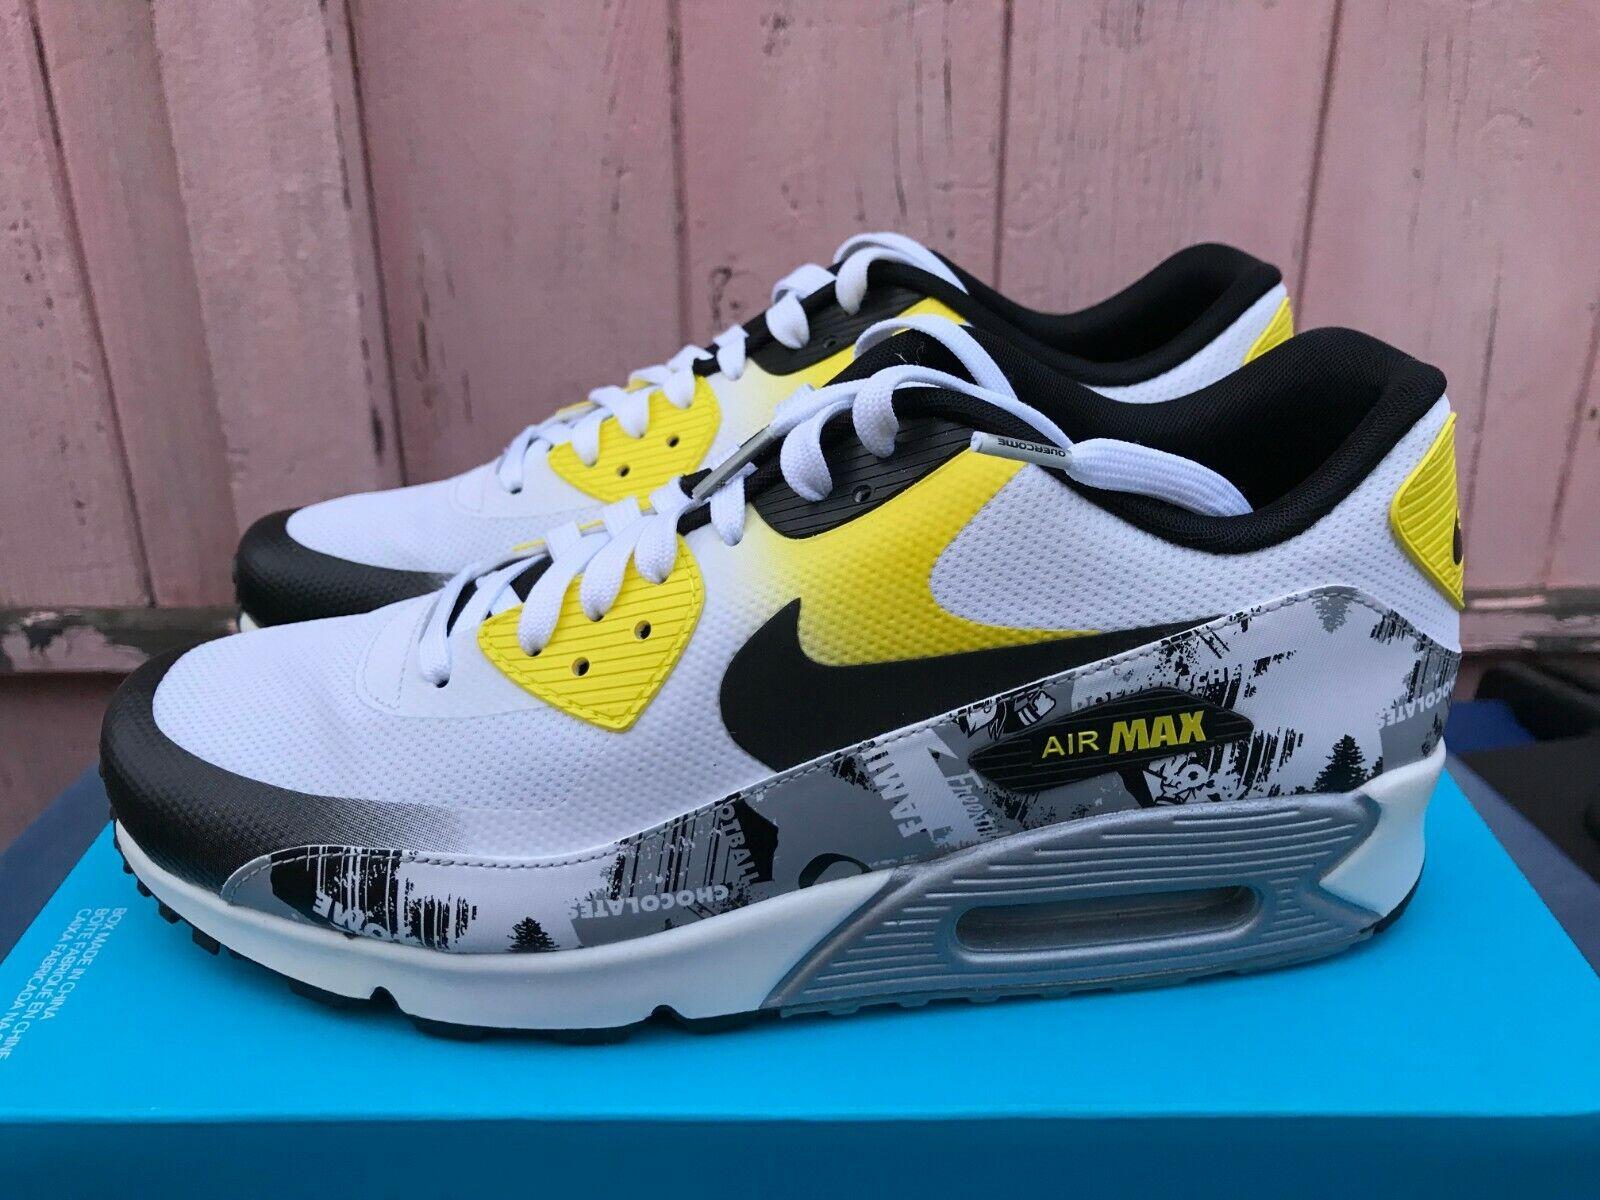 NEW Nike Doernbecher Air Max 90 Oregon Ducks AH6830-100 MENS SIZE 9.5